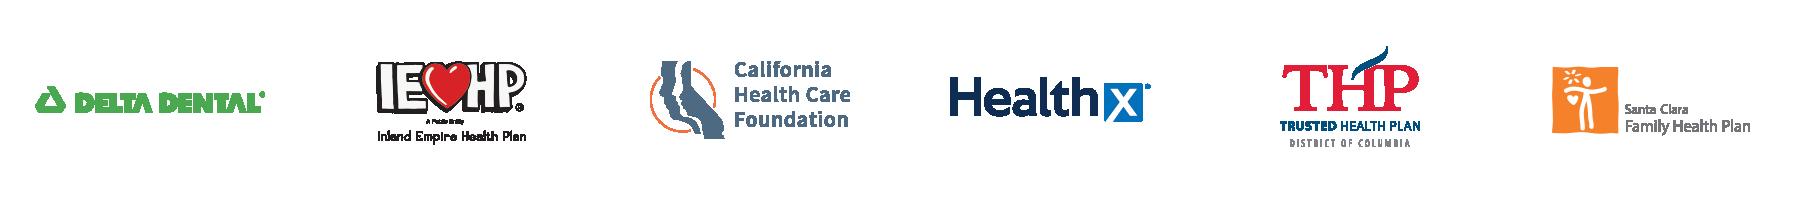 Delta Dental | Inland Empire Health Plan | California Health Care Foundation | Healthx | Trusted Health Plan | Santa Clara Family Health Plan